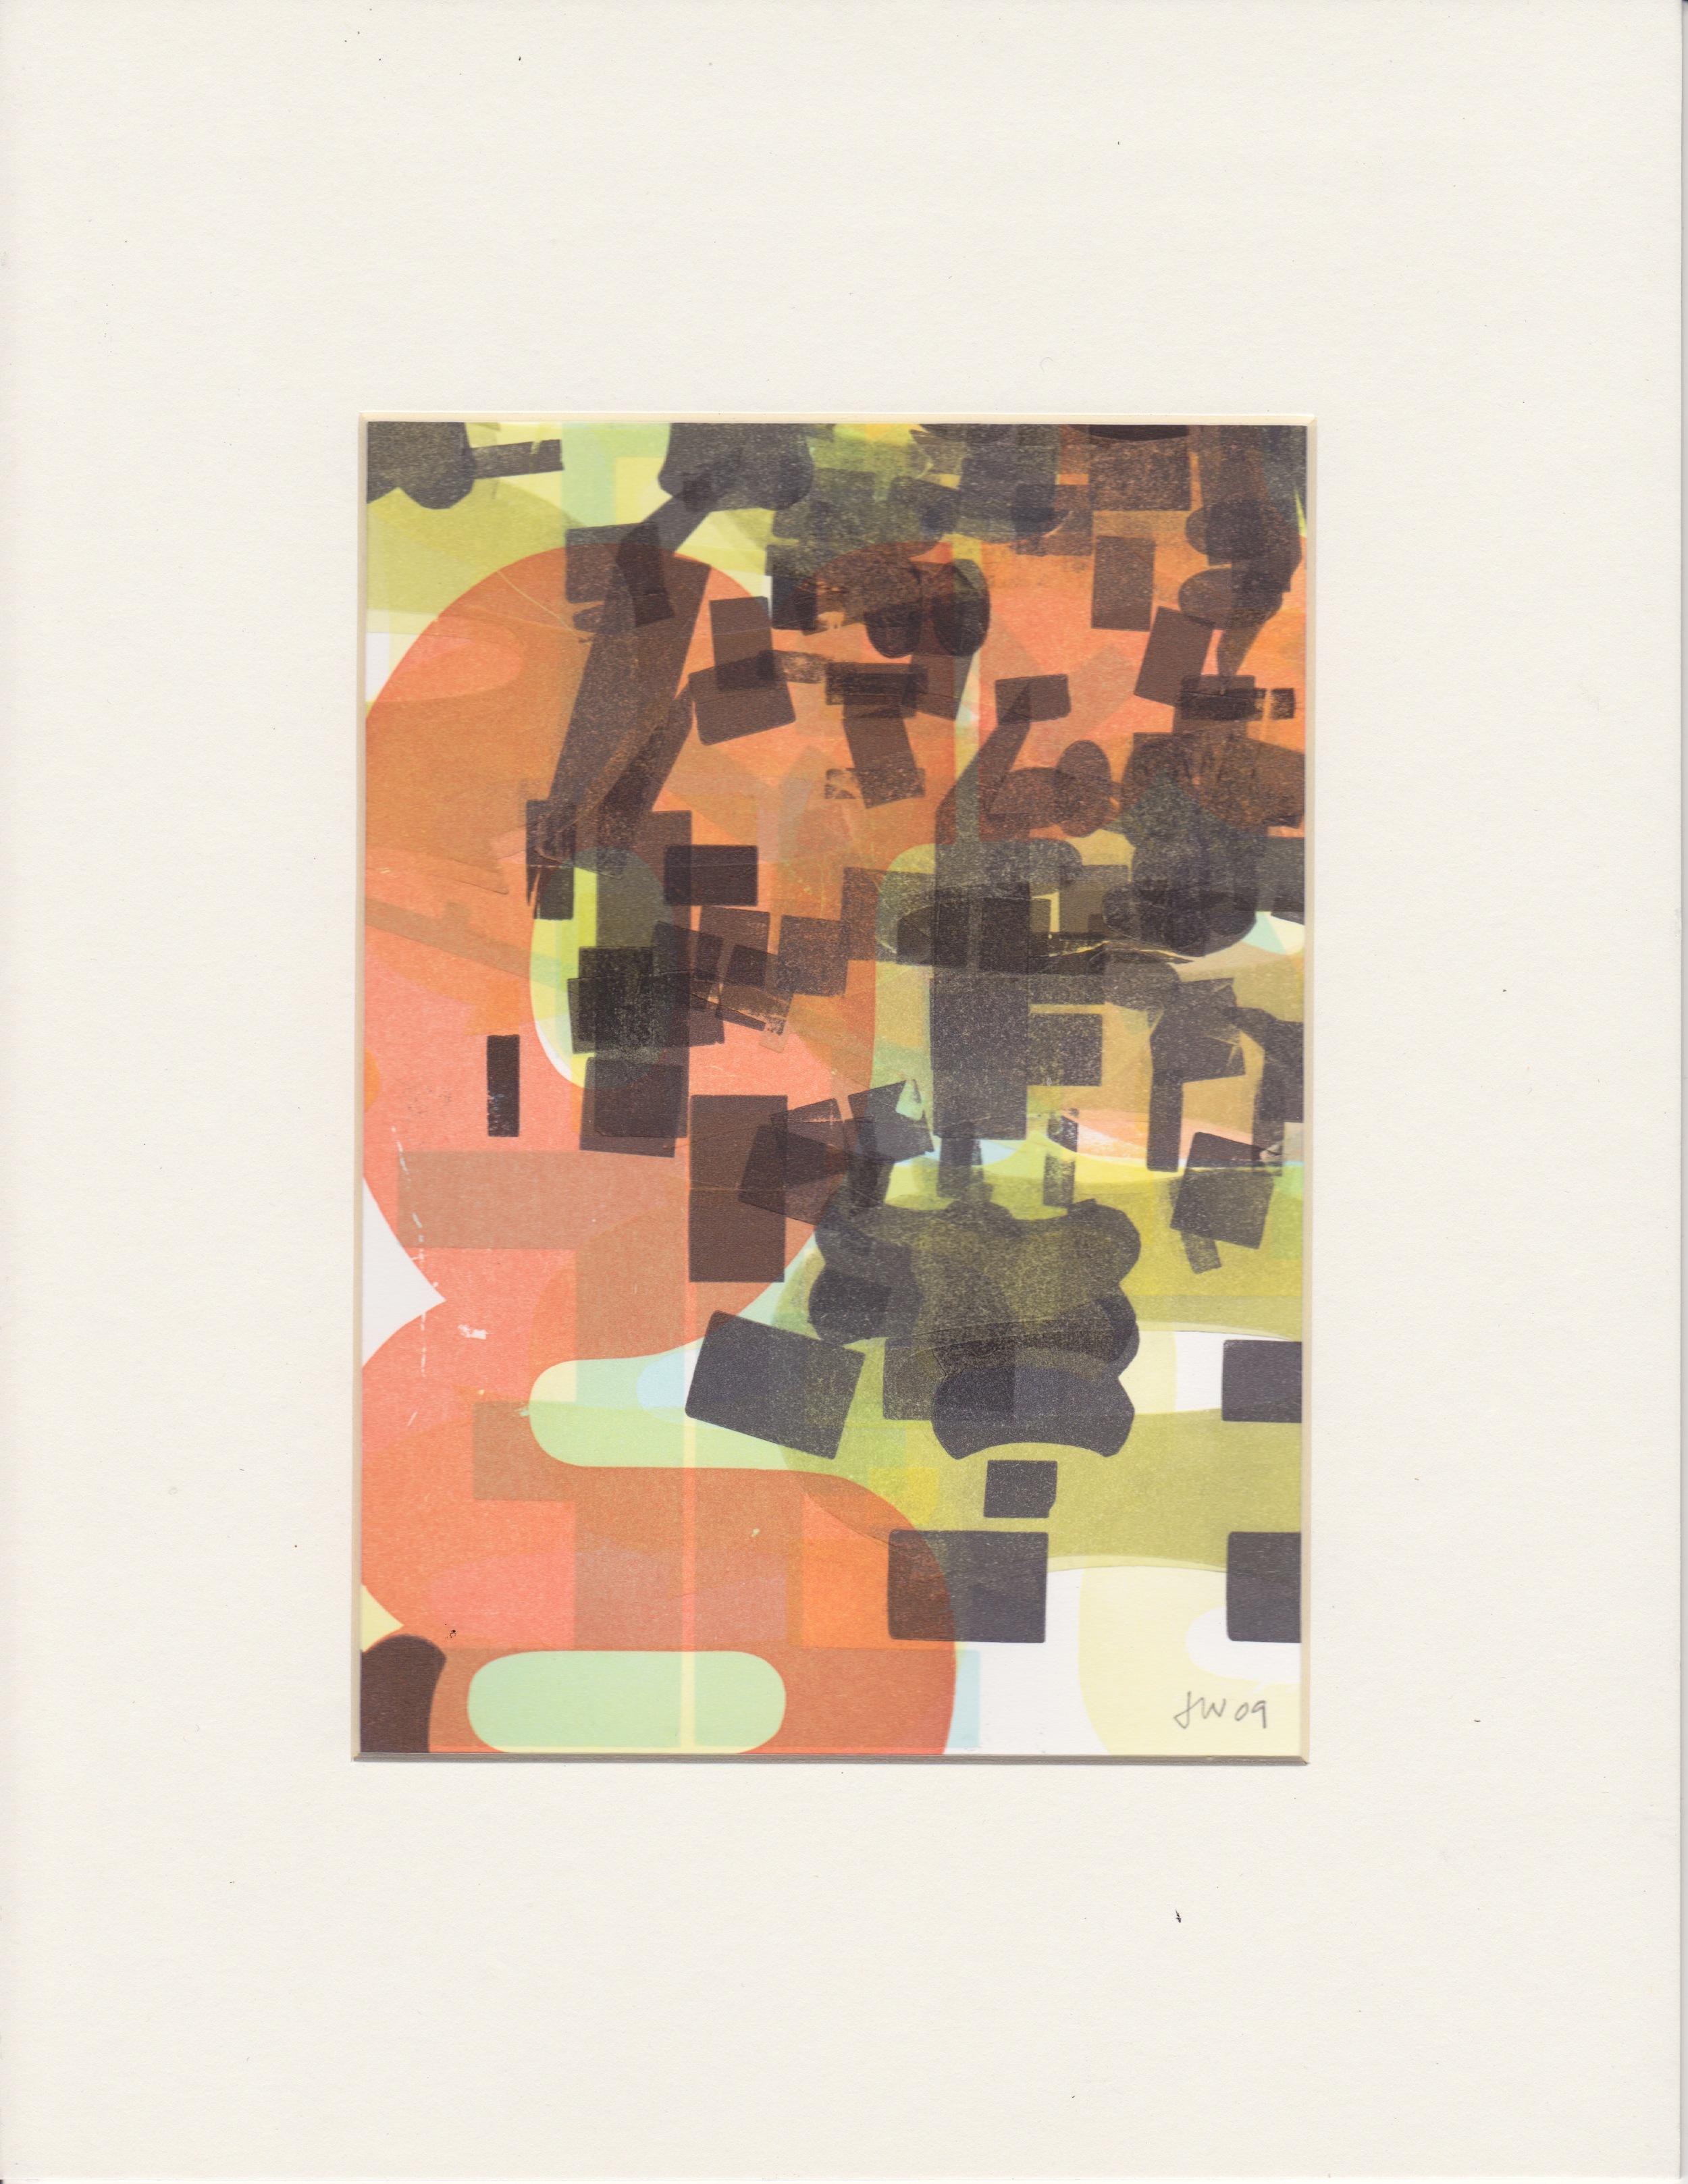 Woodtype Monotype 3